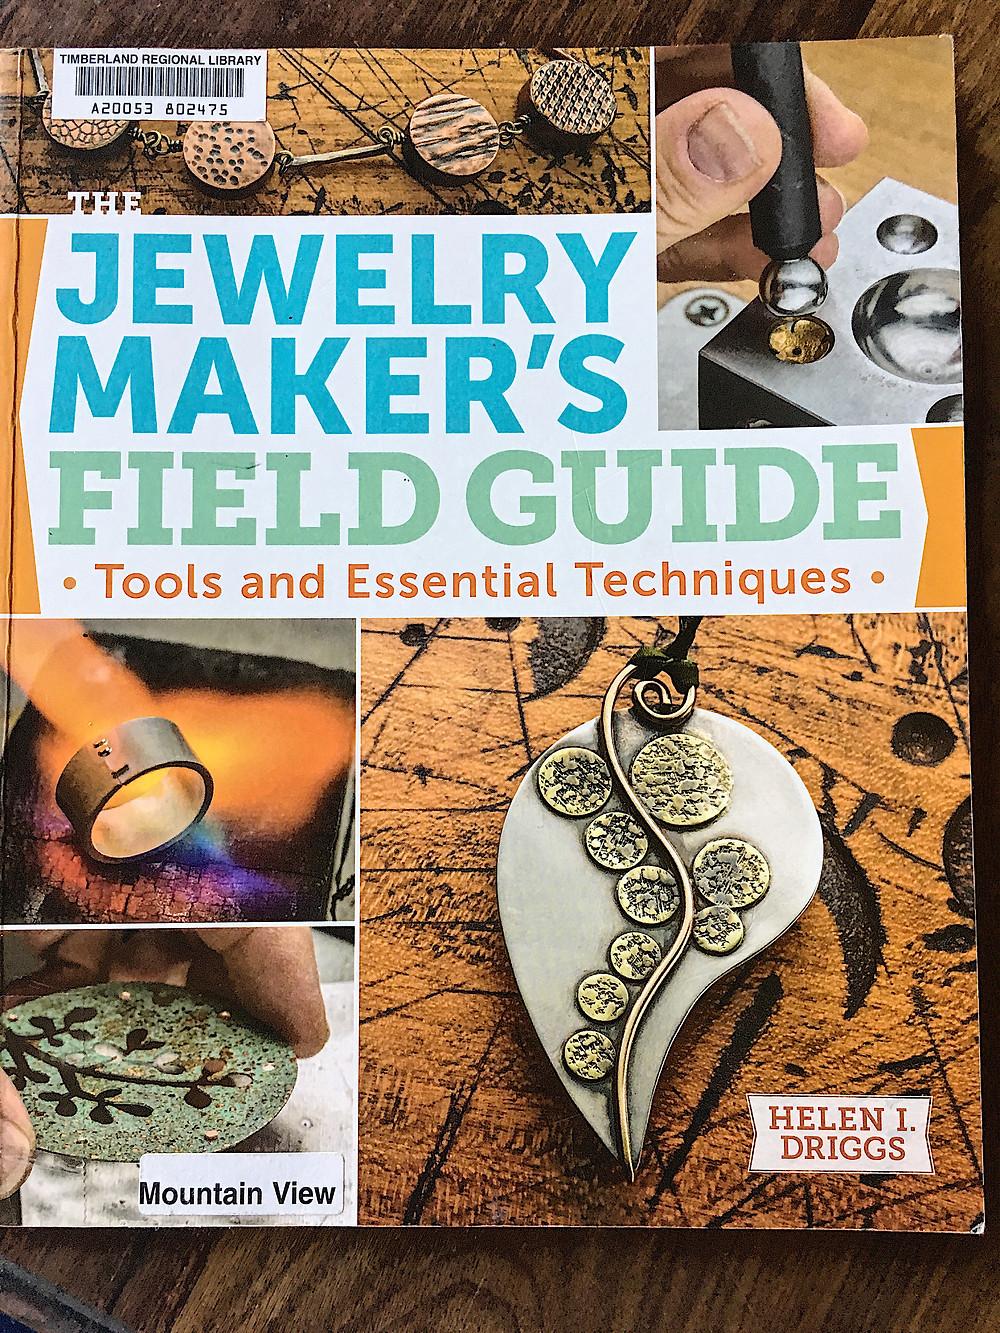 Book cover - Jewelry Maker's Field Guide